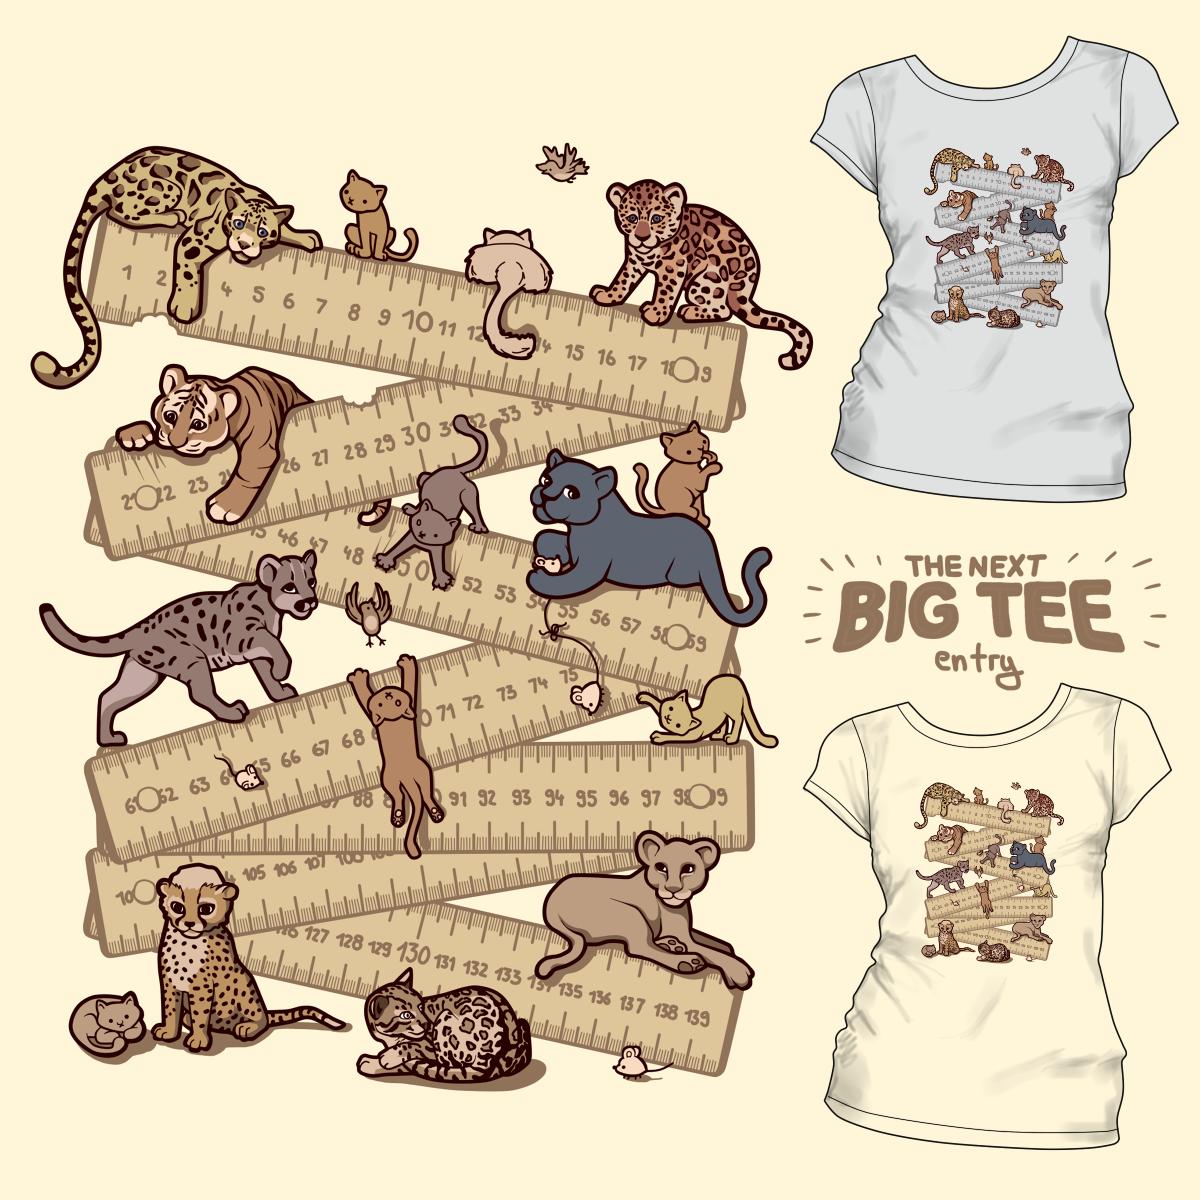 kittens rule by nannynyne on Threadless